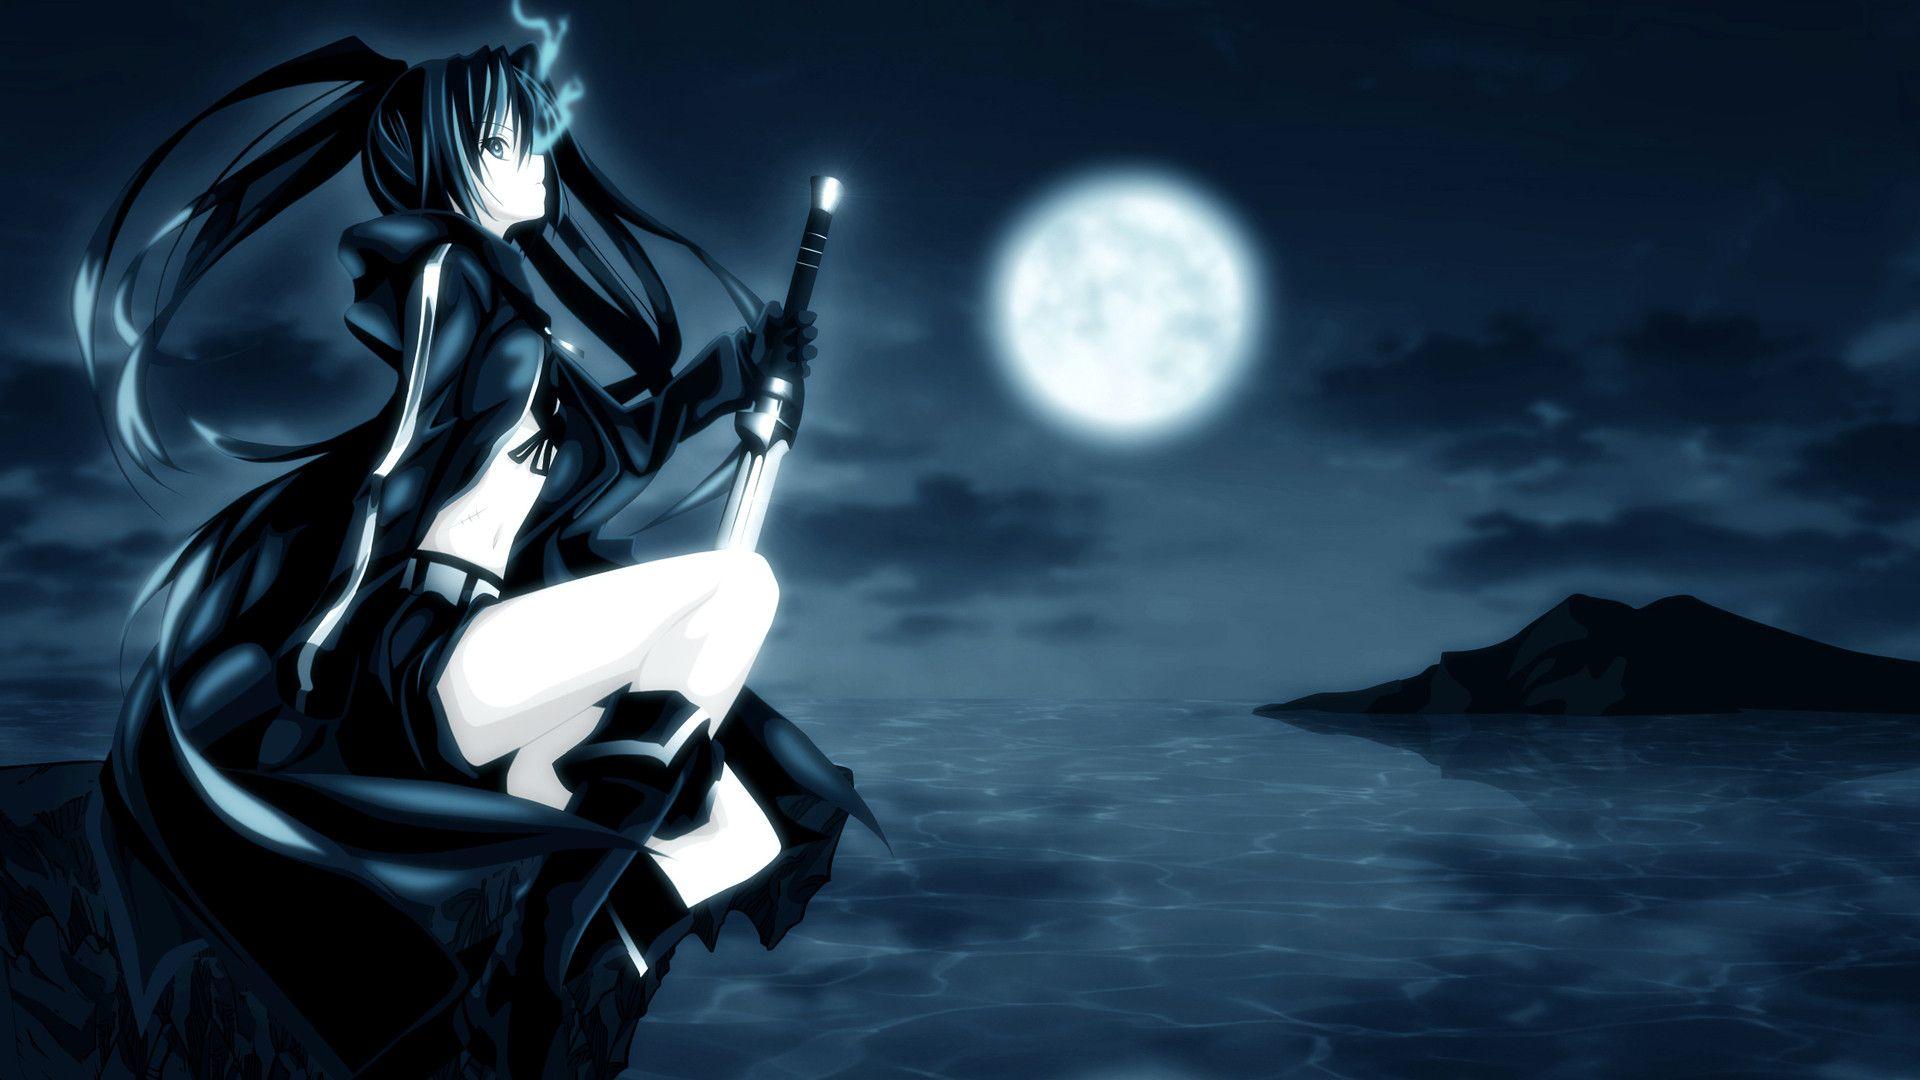 anime wallpaper blue 1920 x 1080 - impremedia